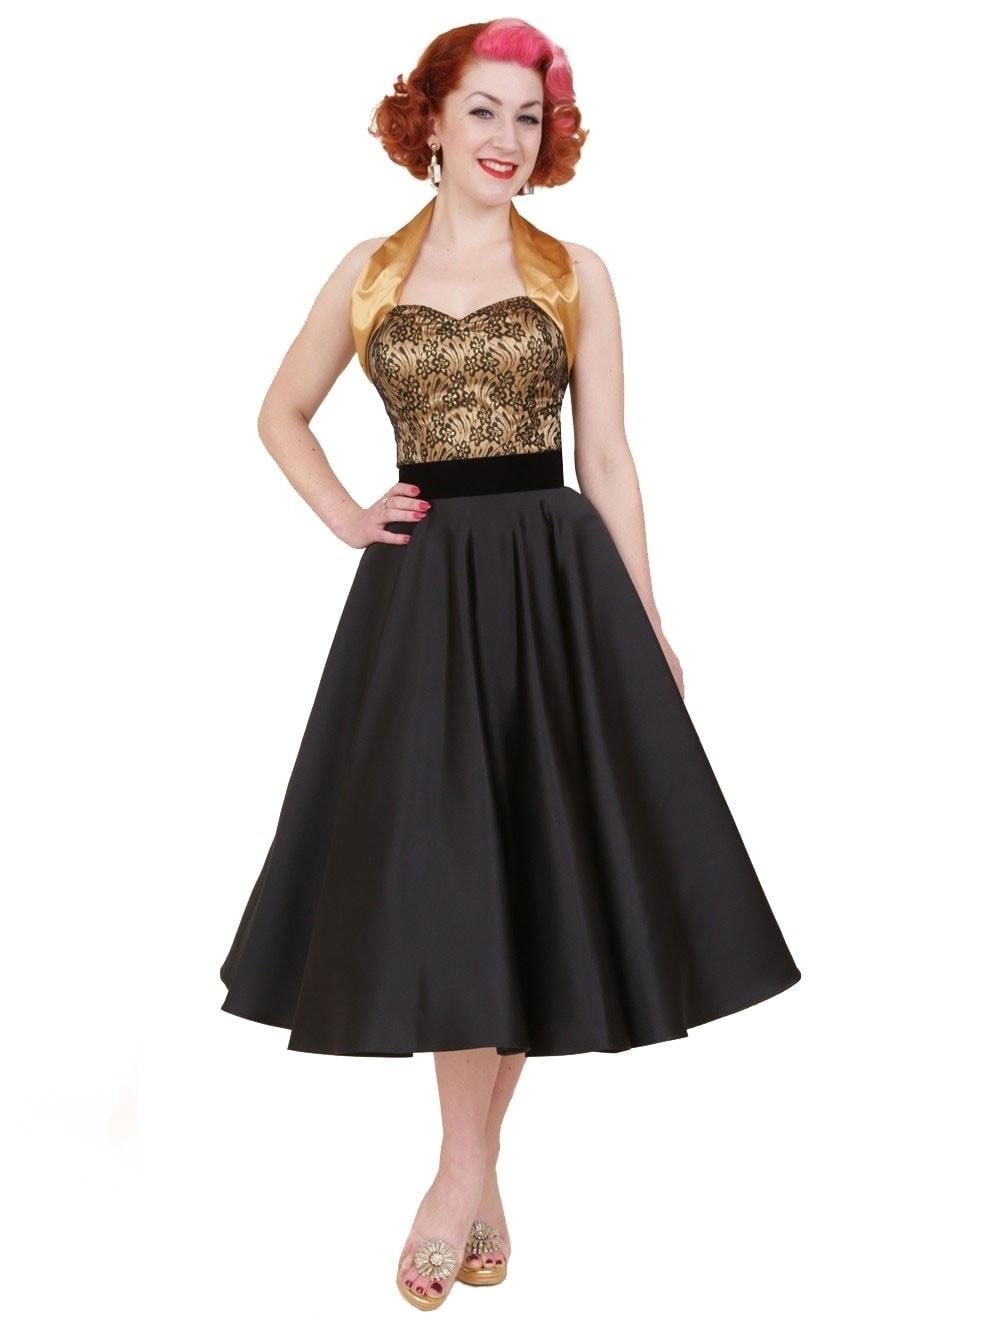 58c5463b1 Black Circle Skirt Outfits Tumblr